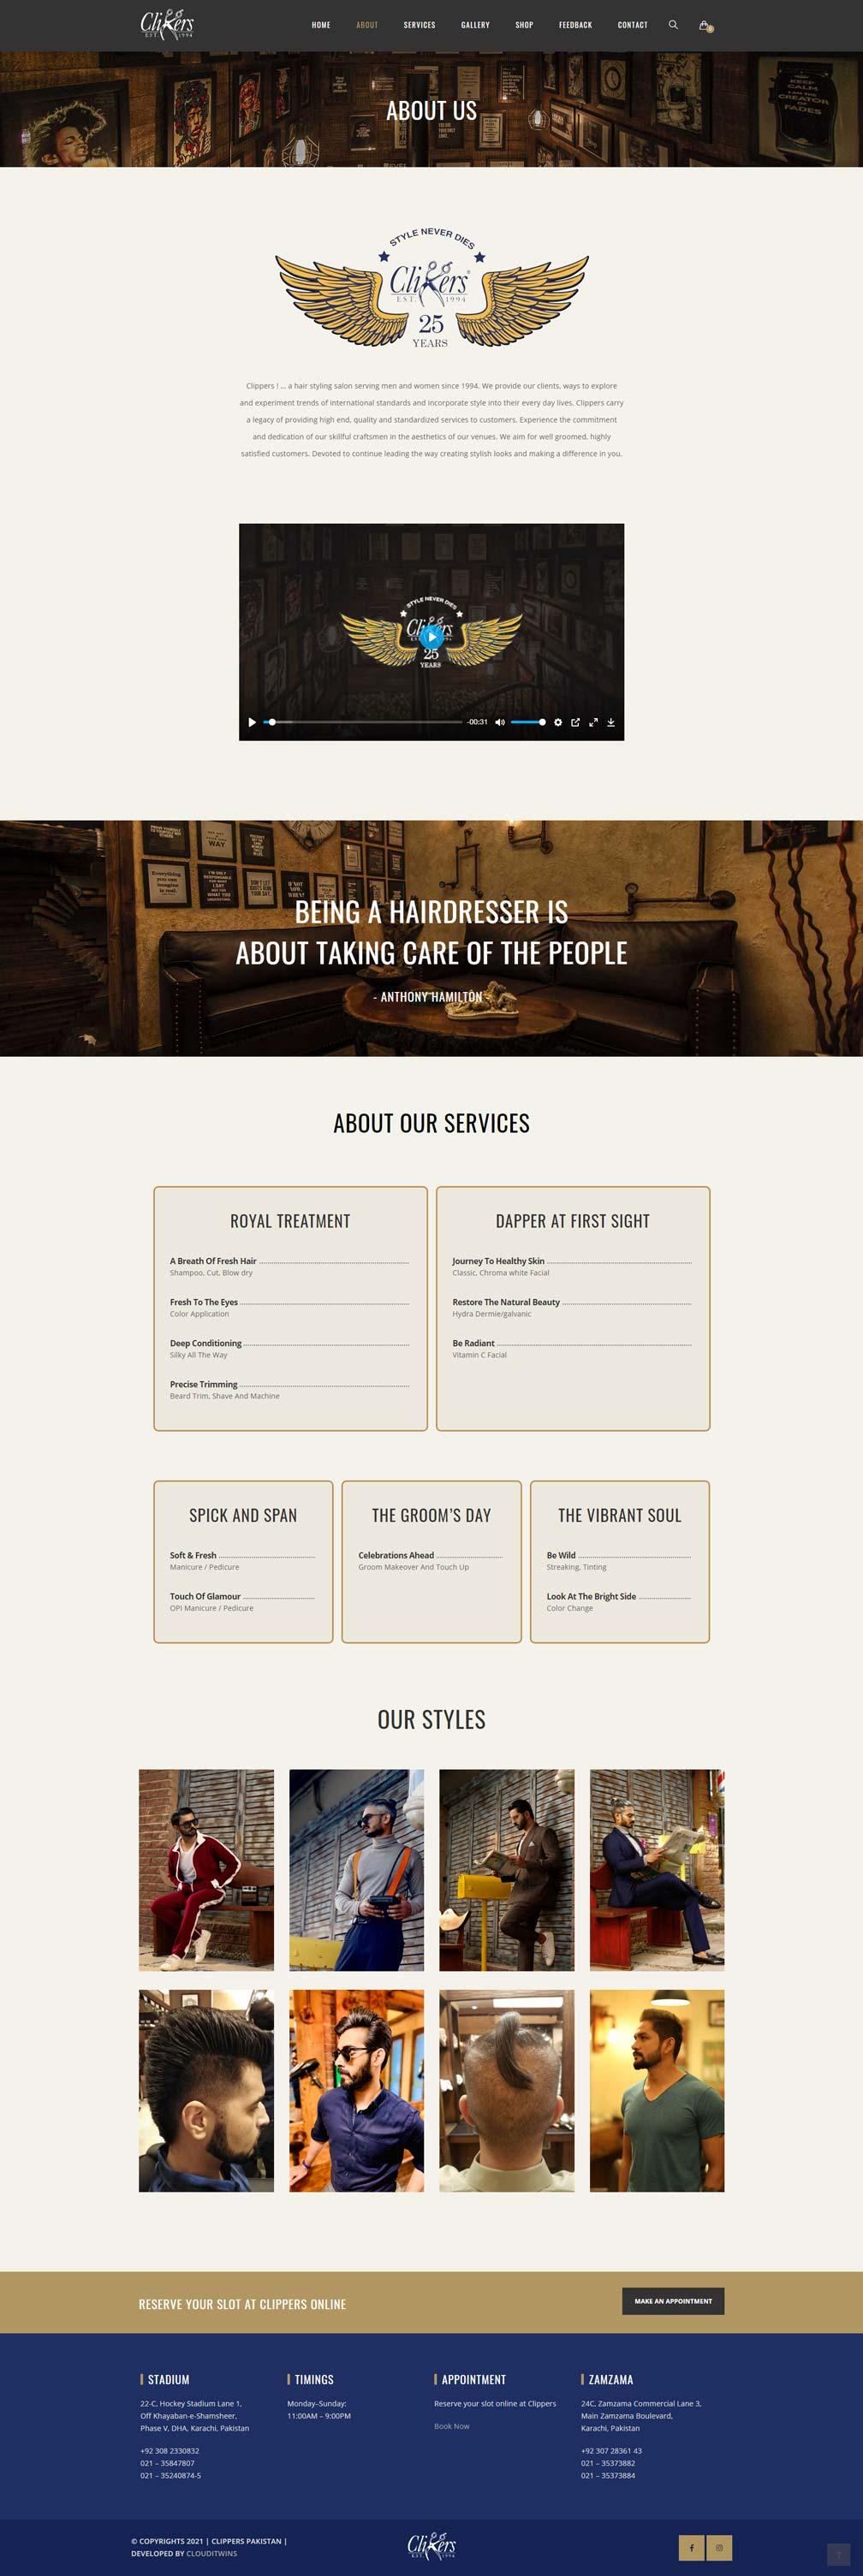 Clippers salon website design